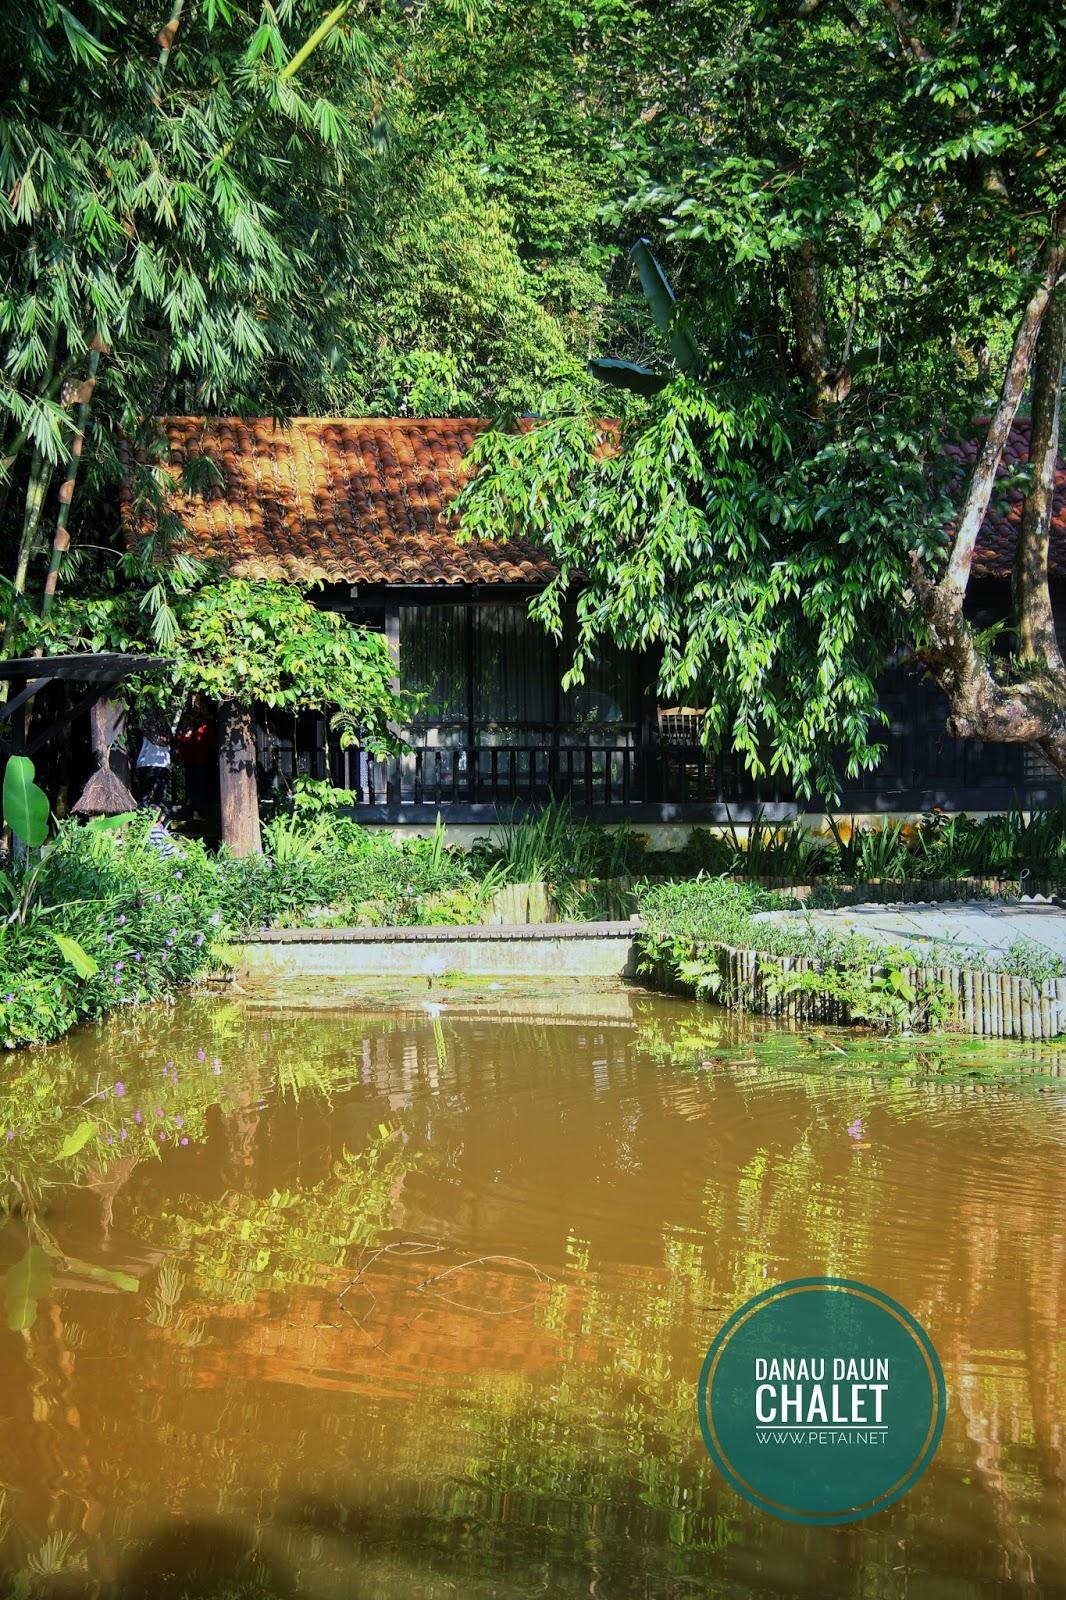 Danau Daun Chalet II